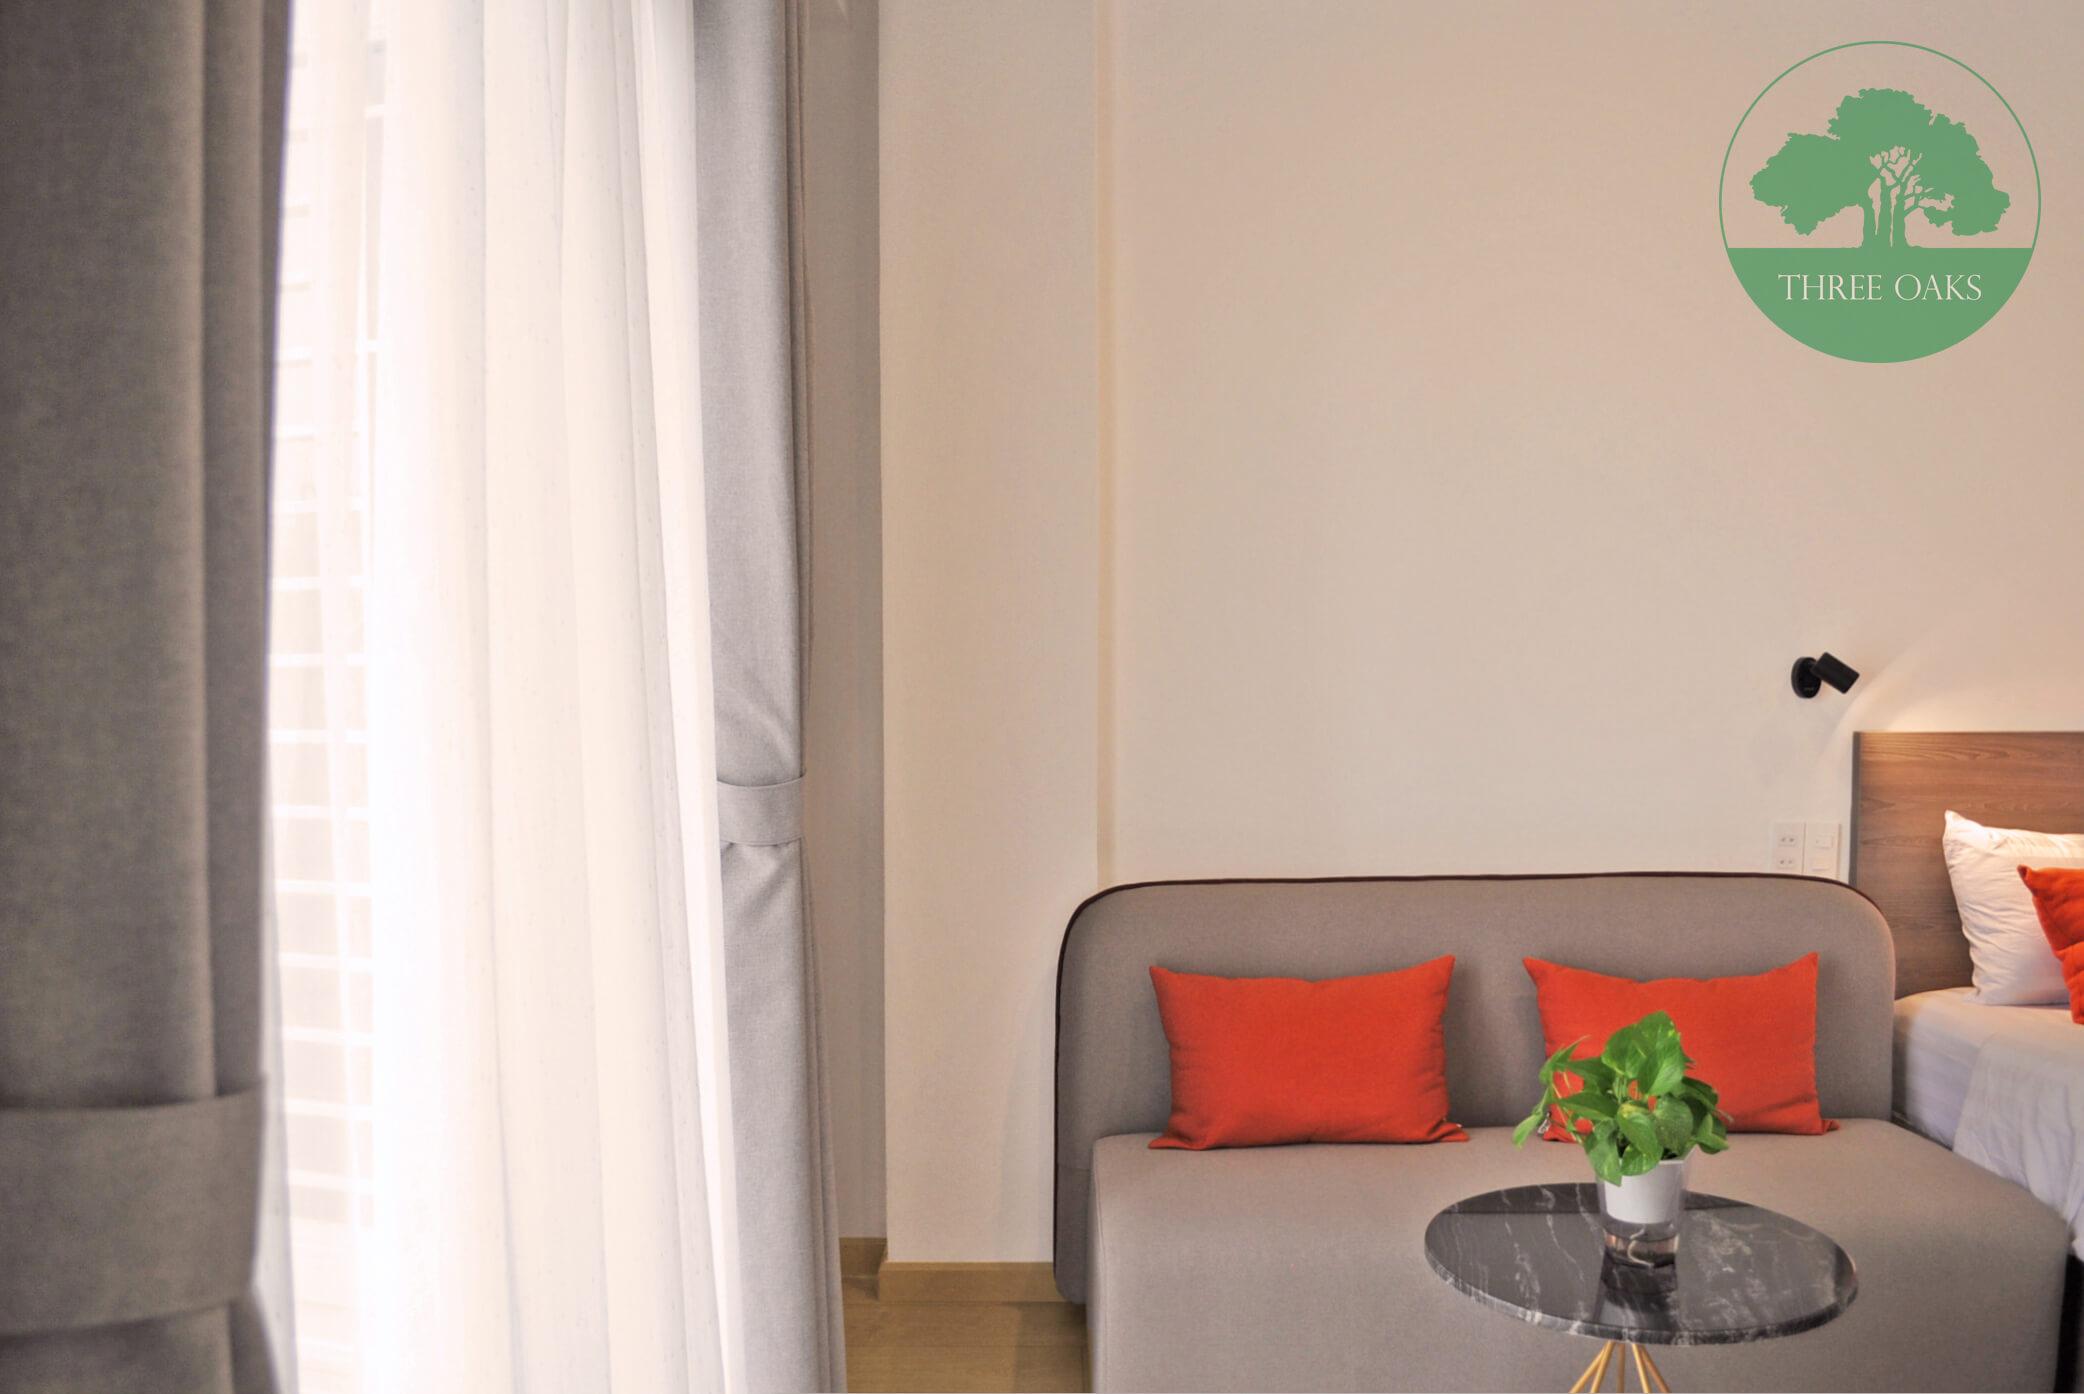 Apartment-for-rent-in-Ho-Chi-Minh-city-Saigon-threeoaks-6-Balcony-3